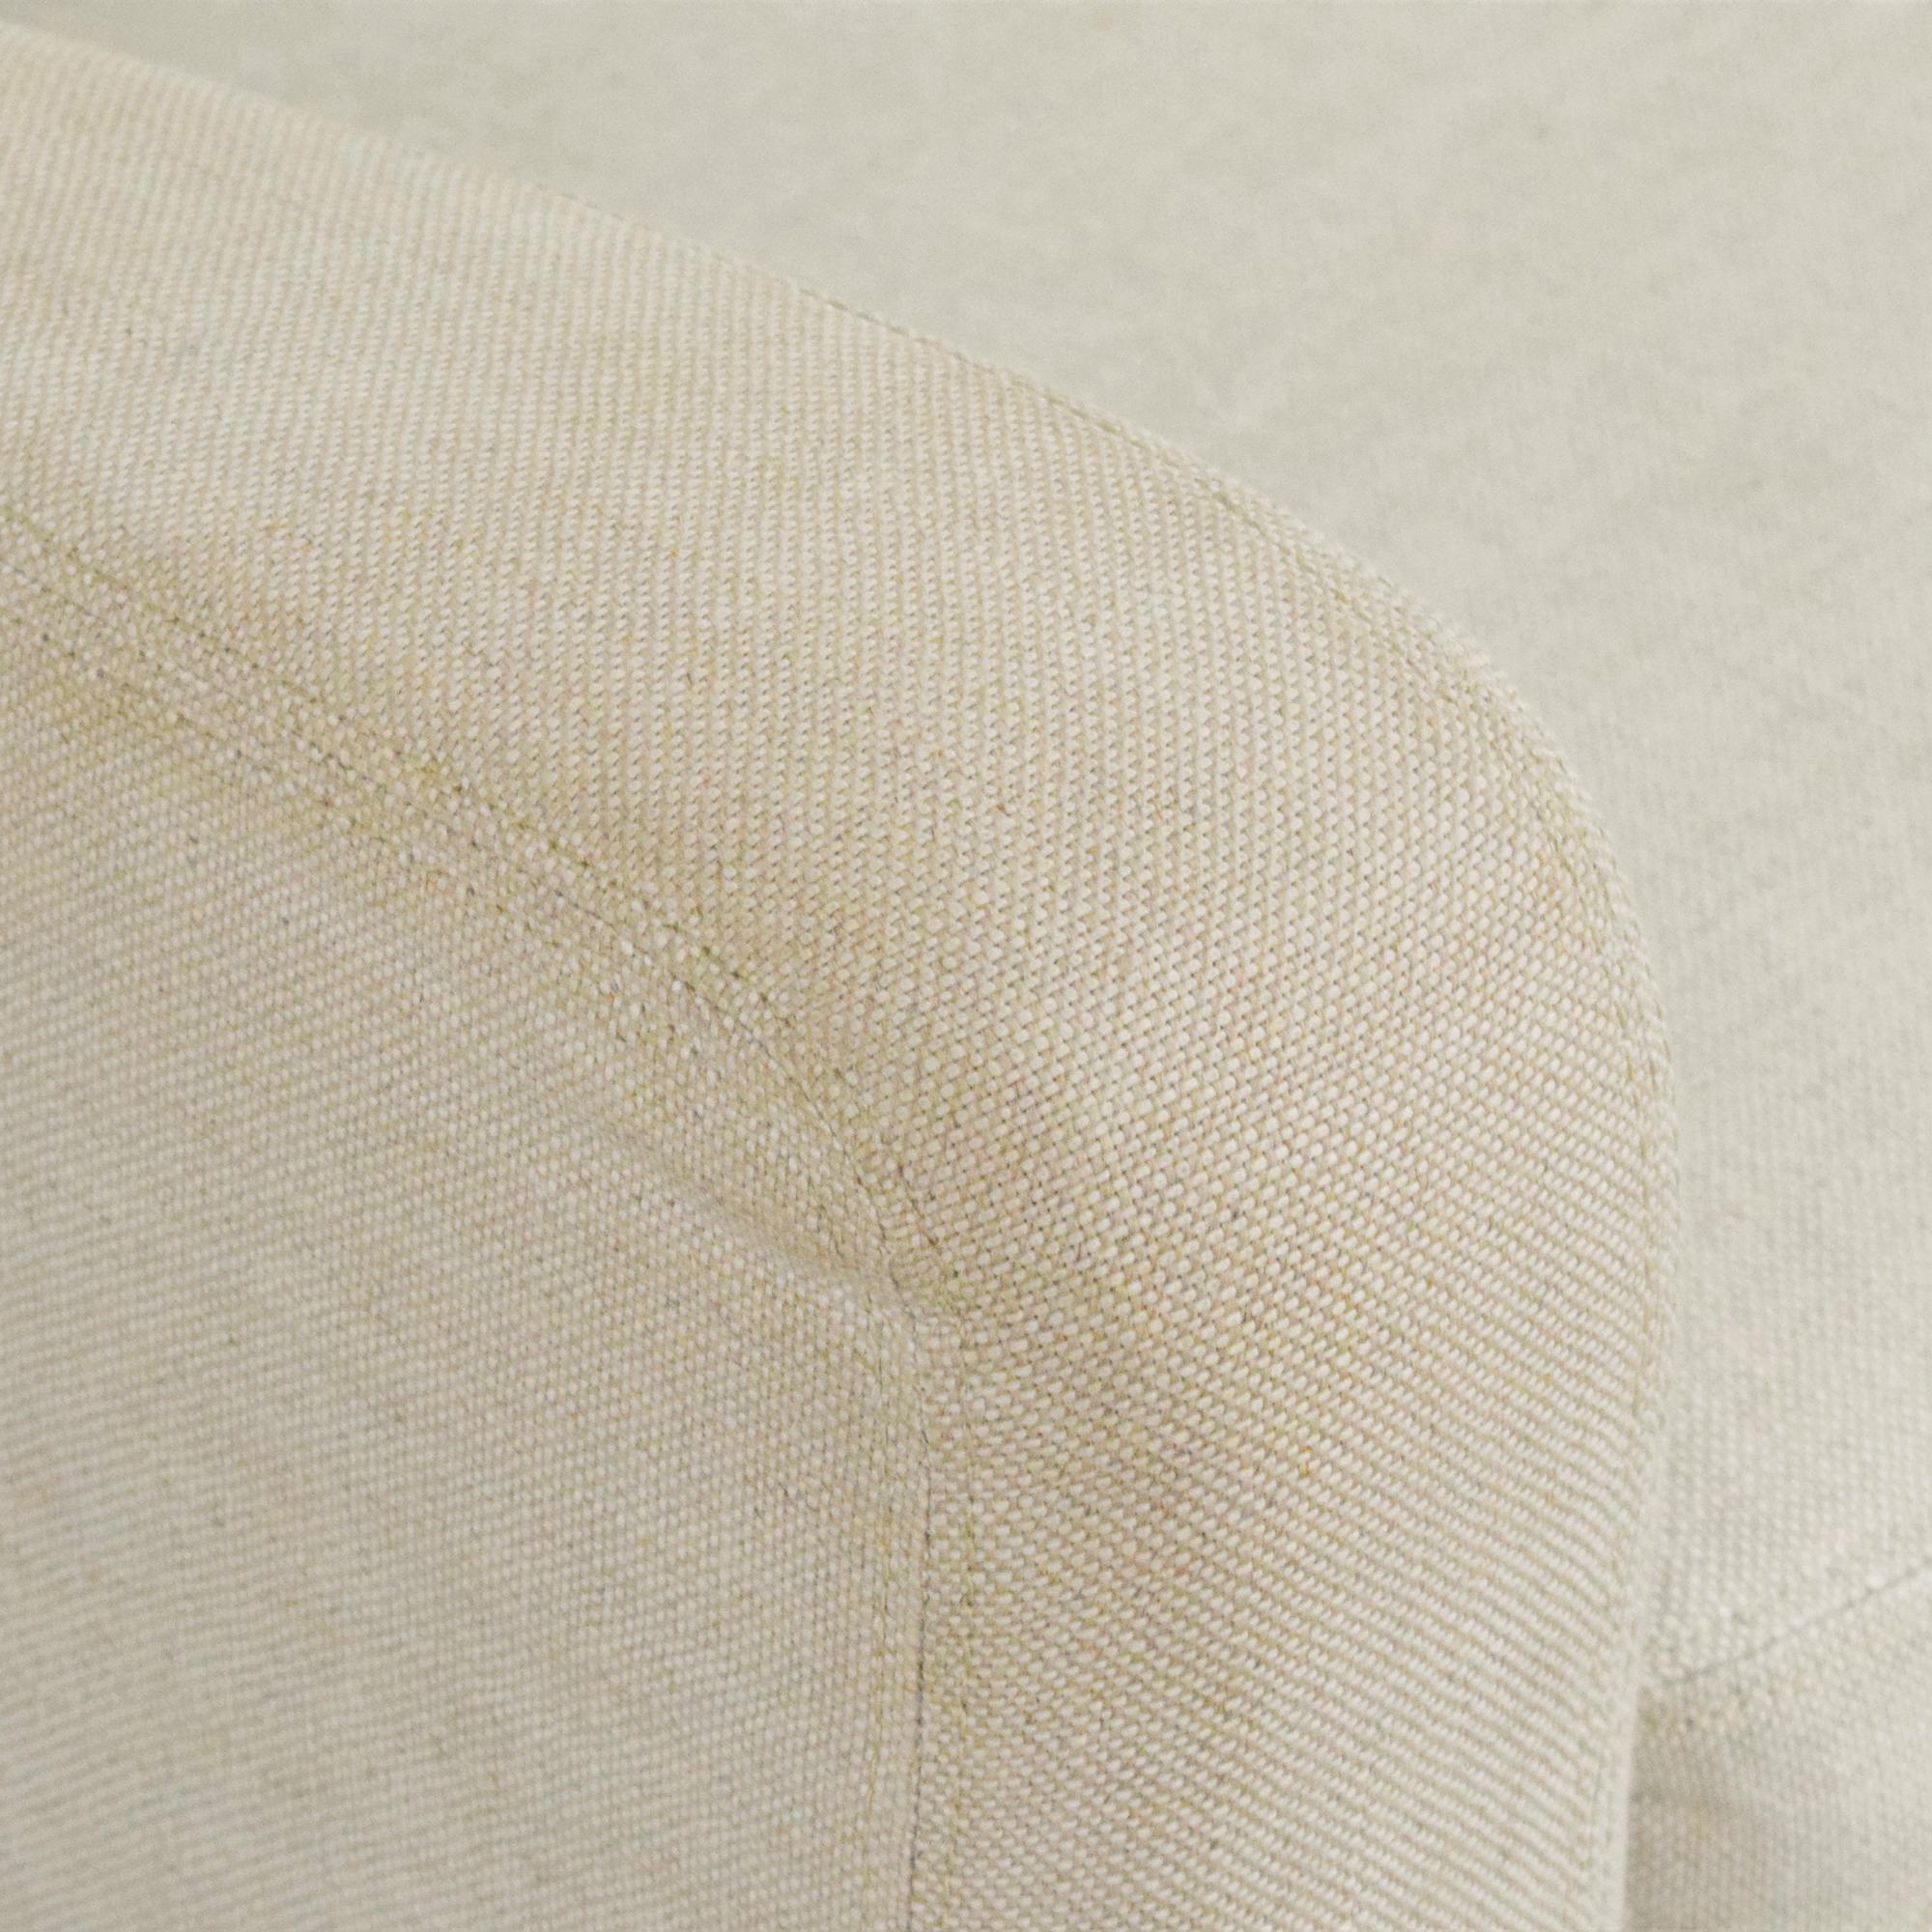 Restoration Hardware Restoration Hardware Belgian Slope Arm Slipcover Sofa discount